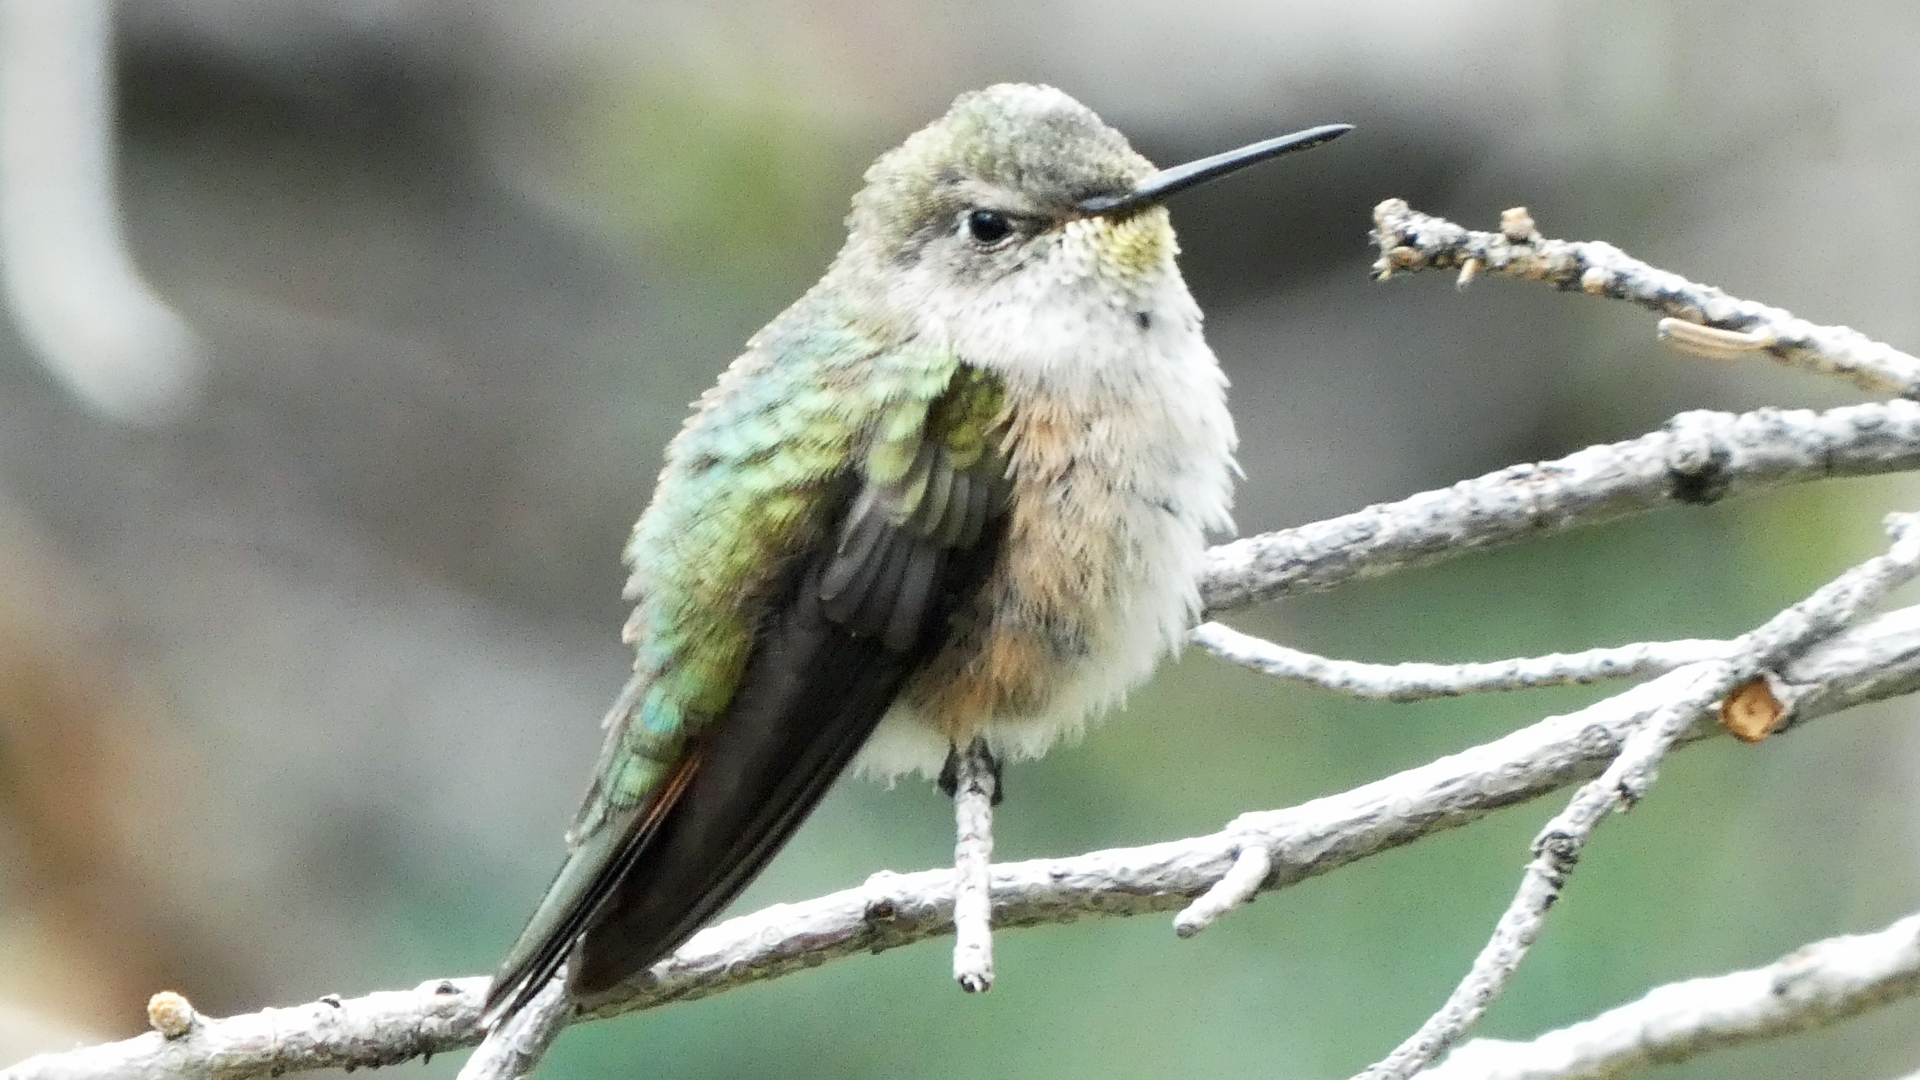 Female or immature, Sandia Mountains, August 2021